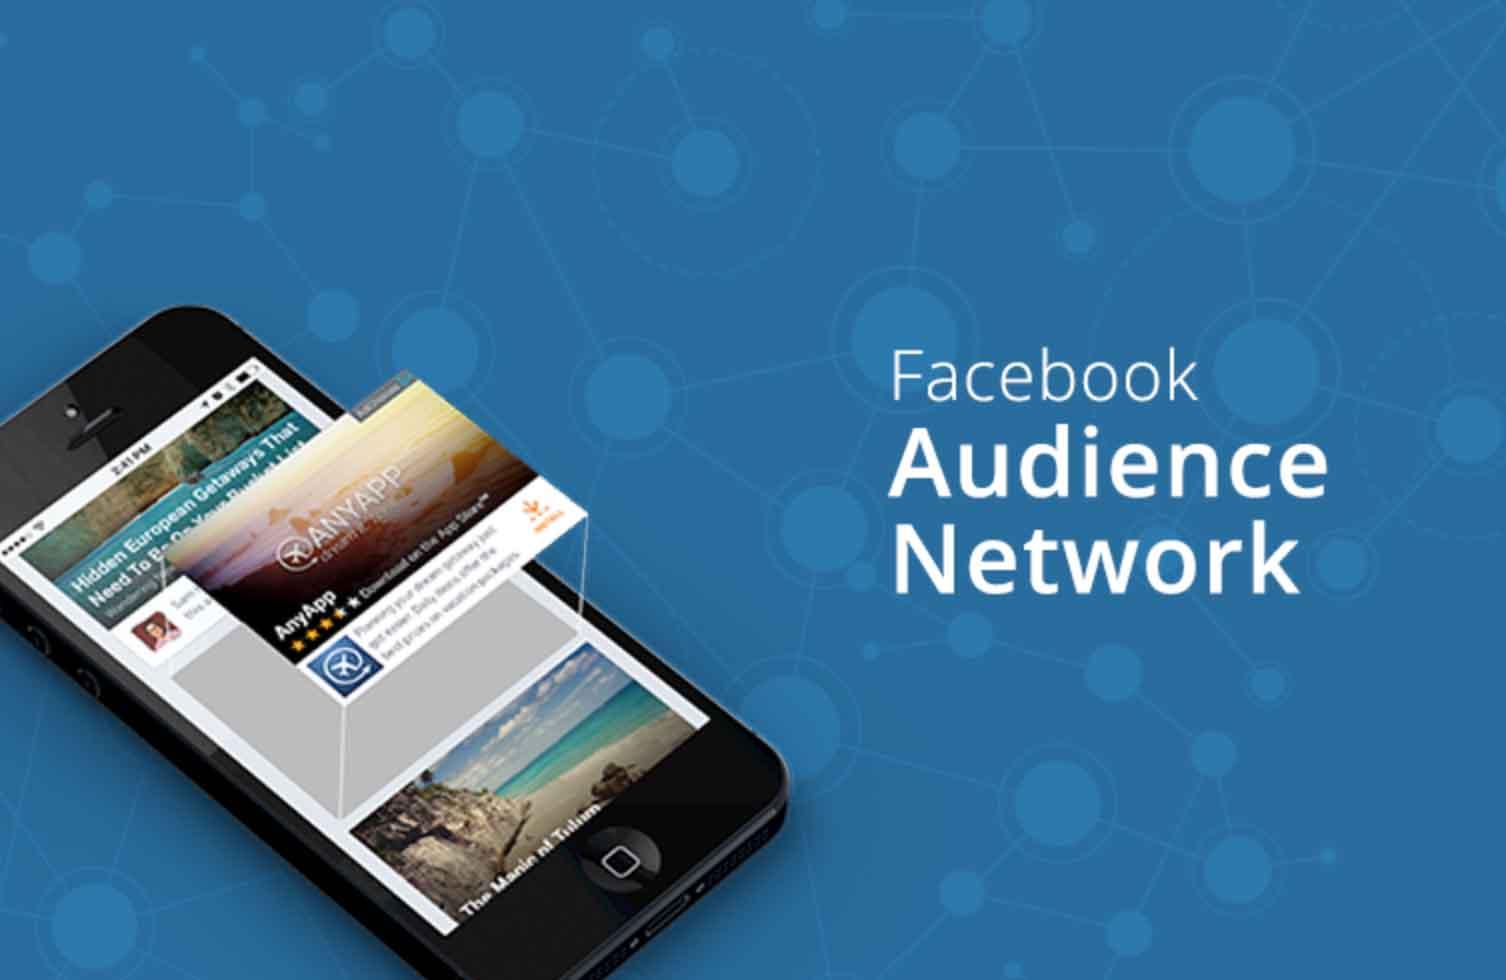 Facebook audience network set up ads